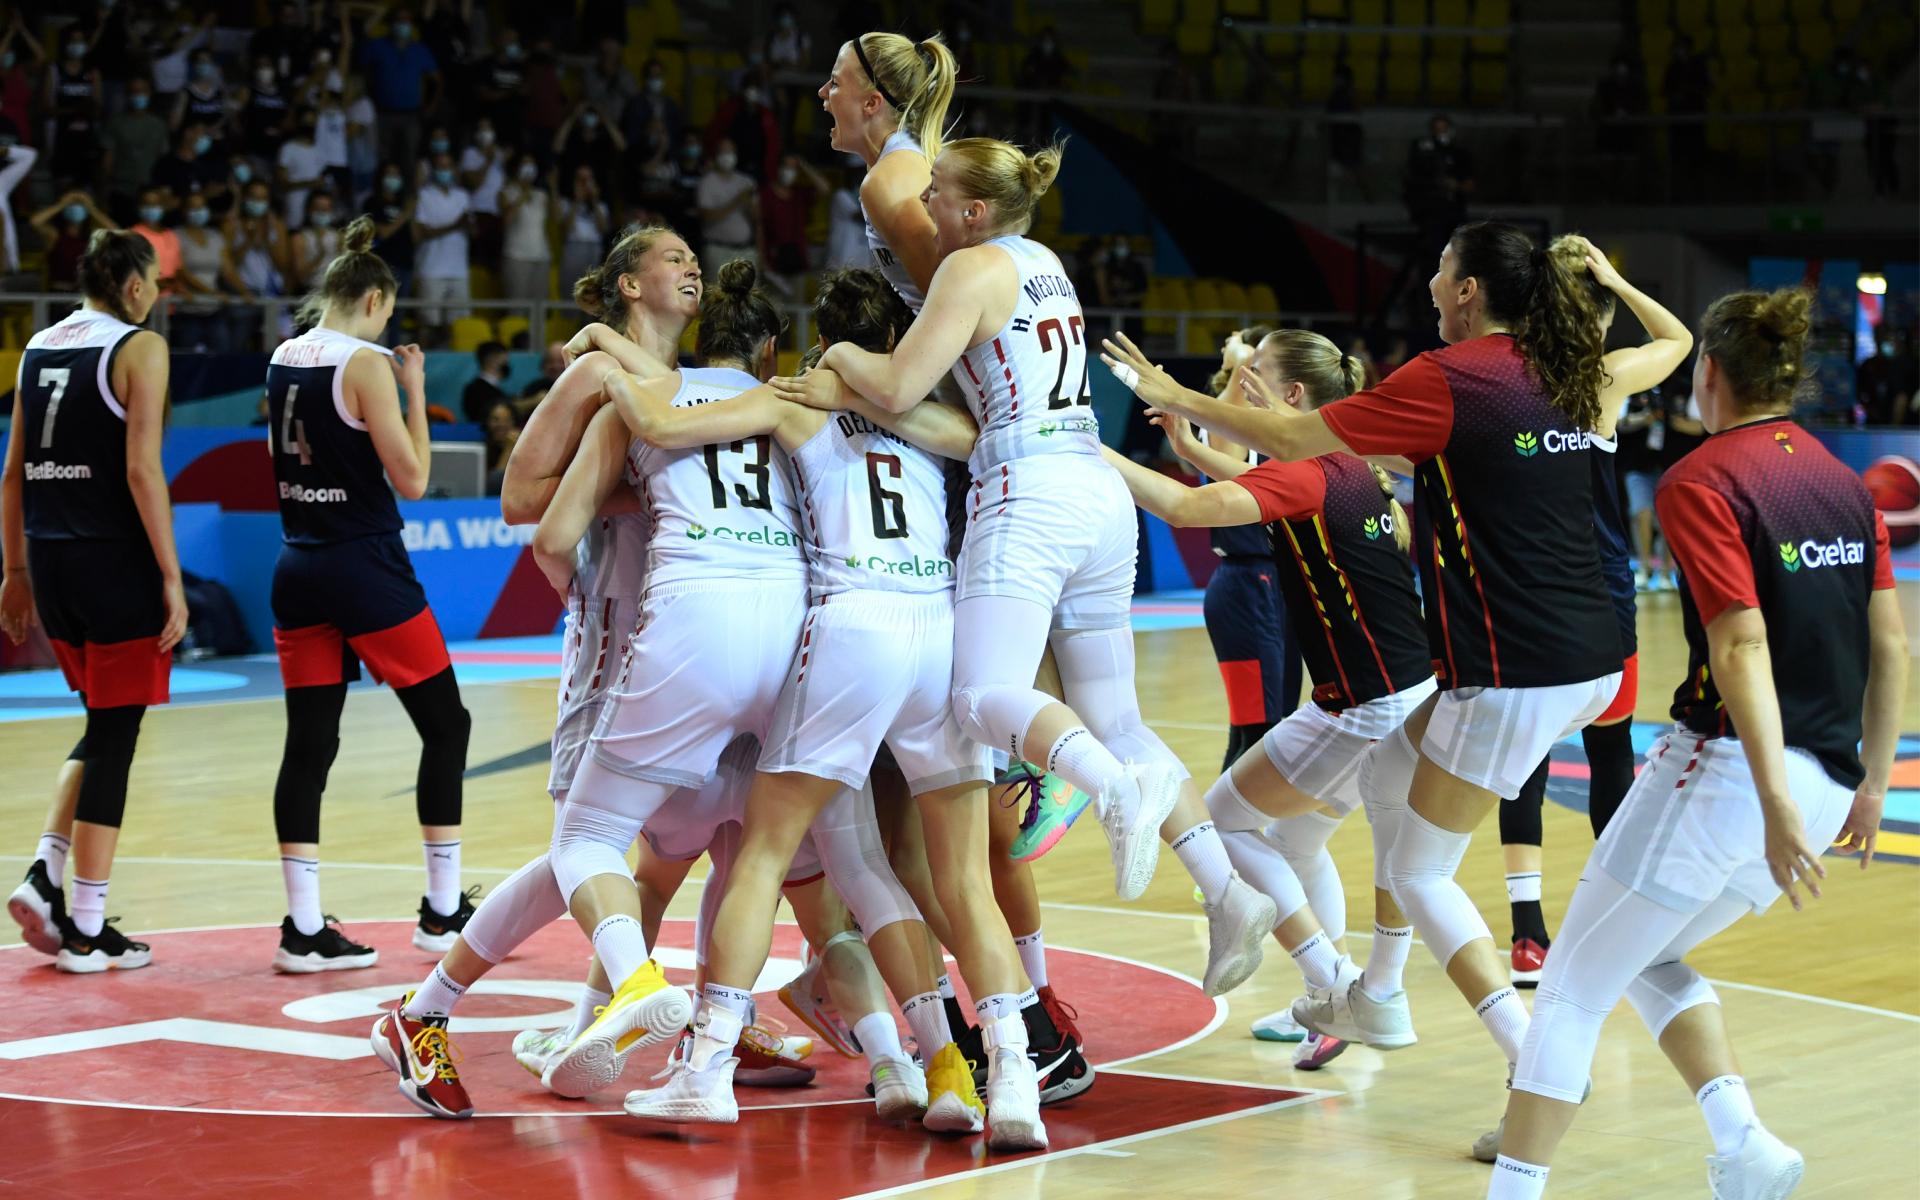 Фото: Баскетболистки сборной Бельгии (Global Look Press)